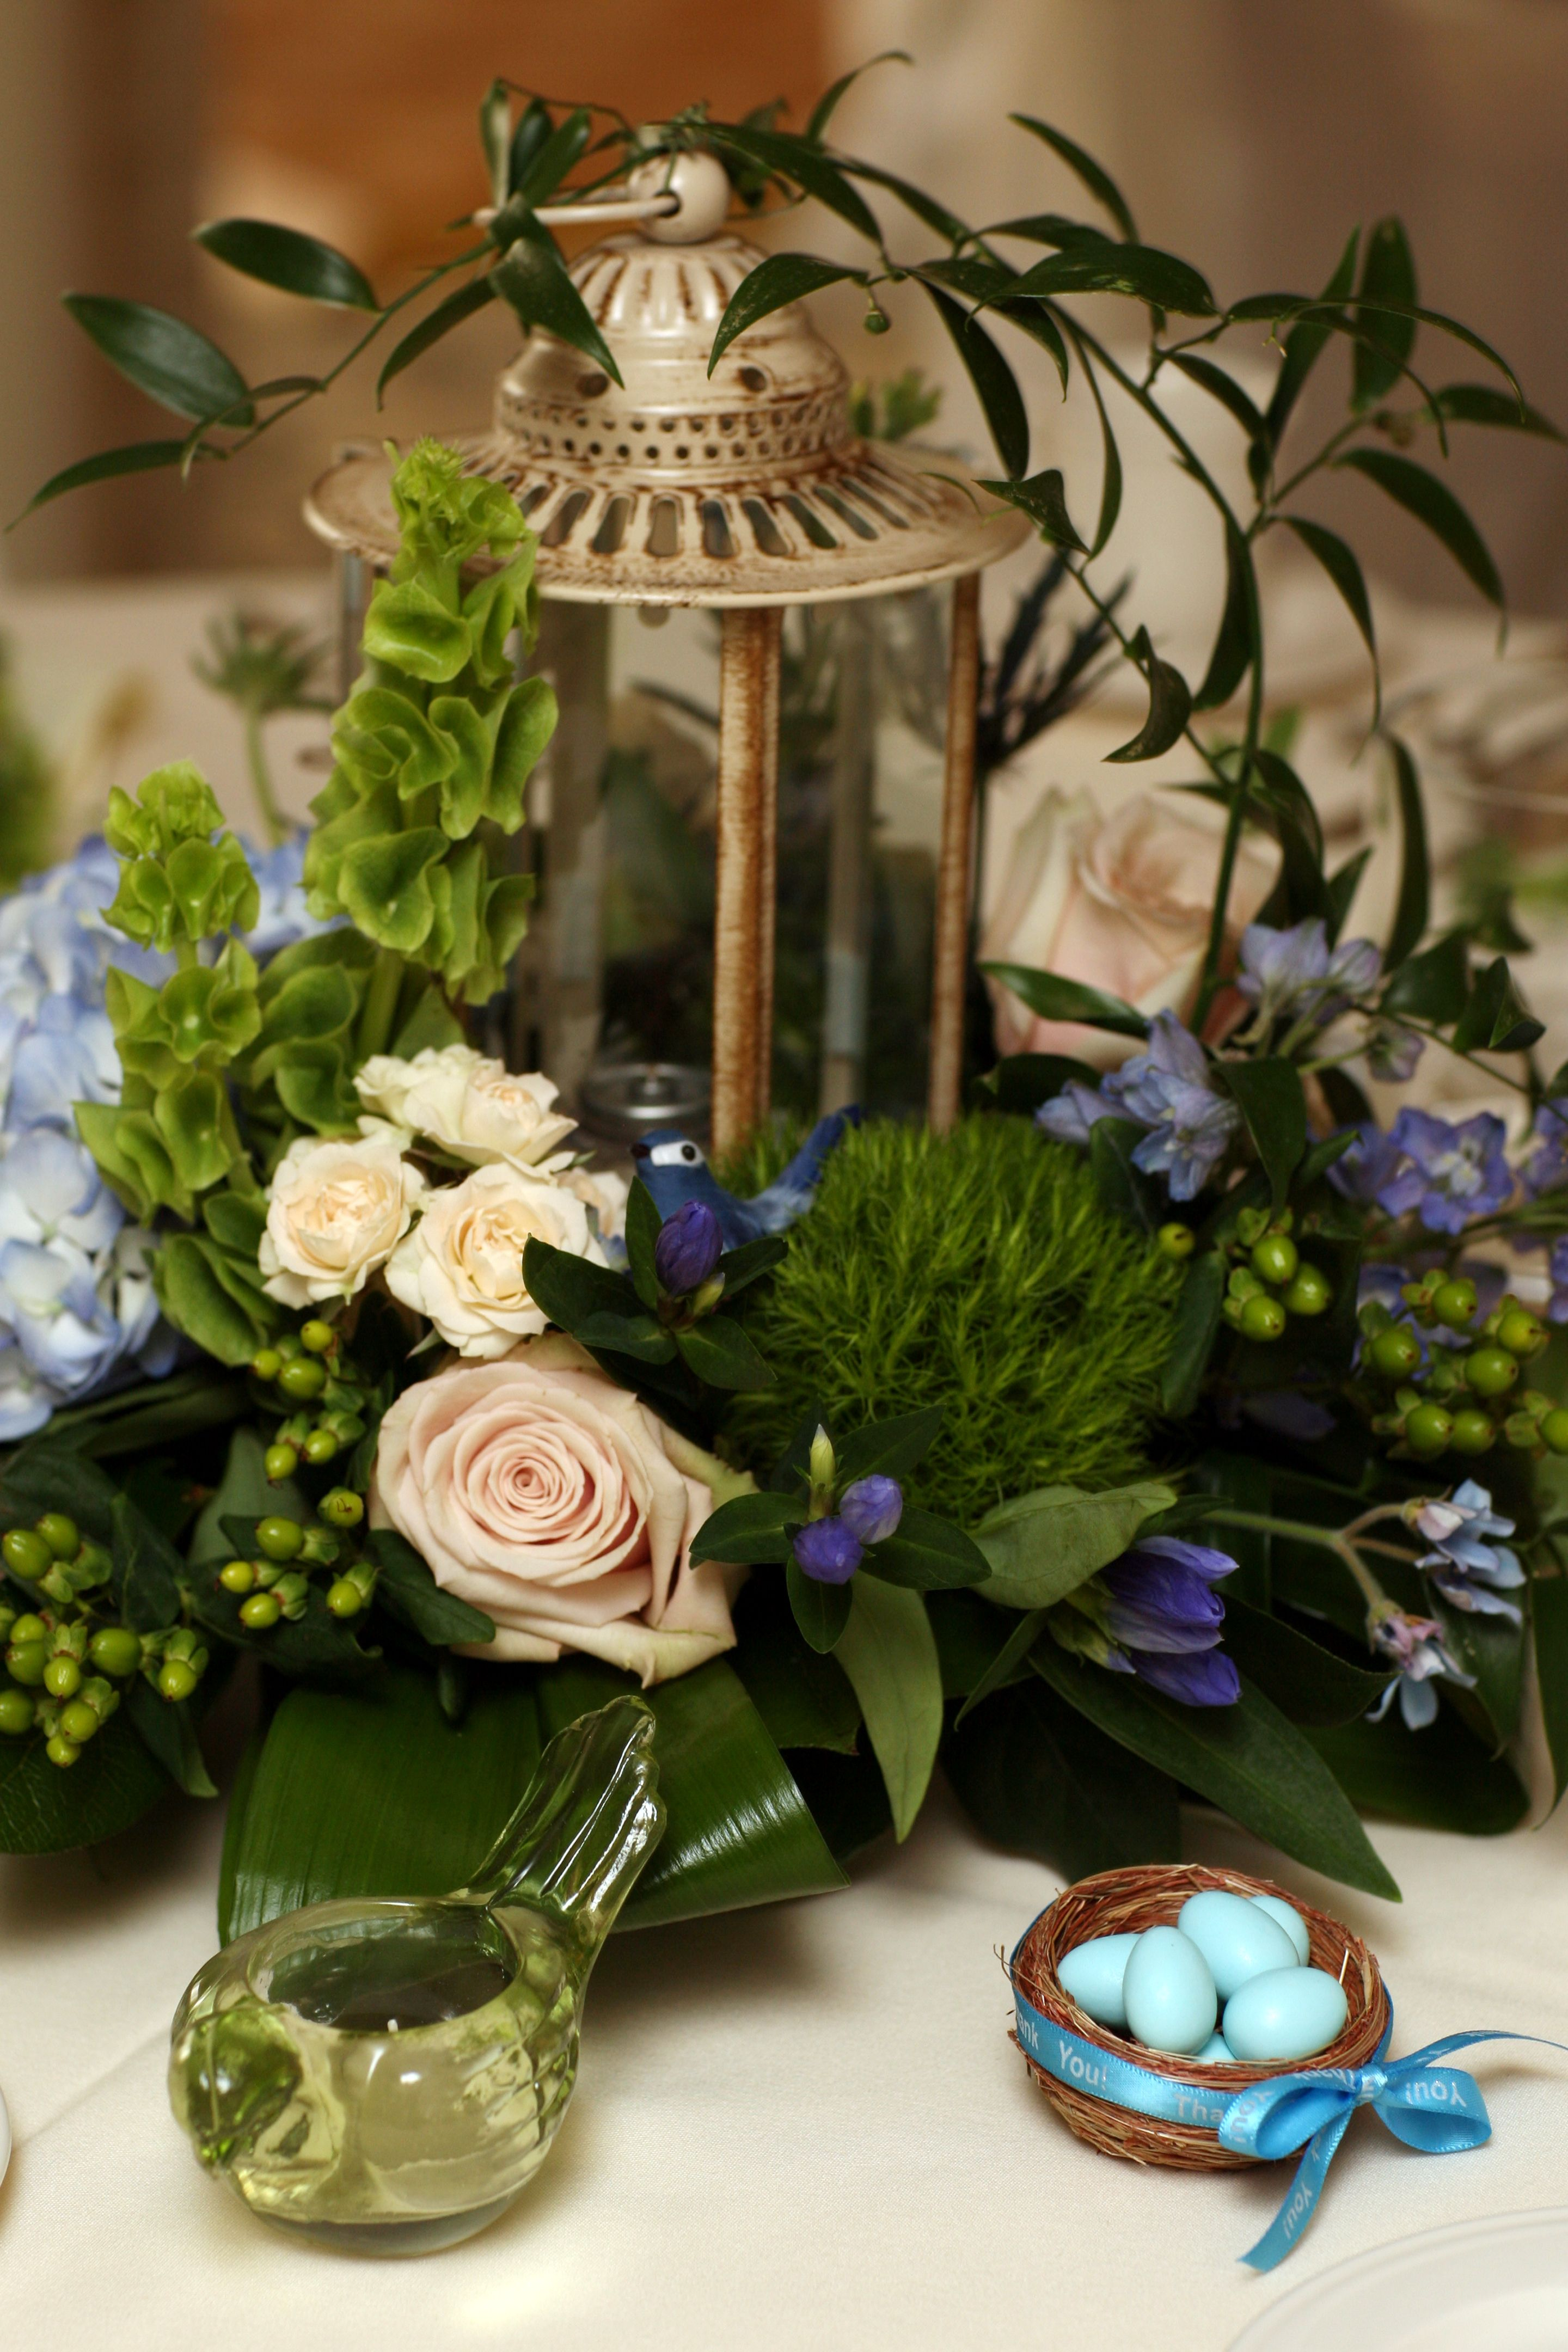 Wedding Centerpiece With A Garden Theme Lantern An Abundance Of